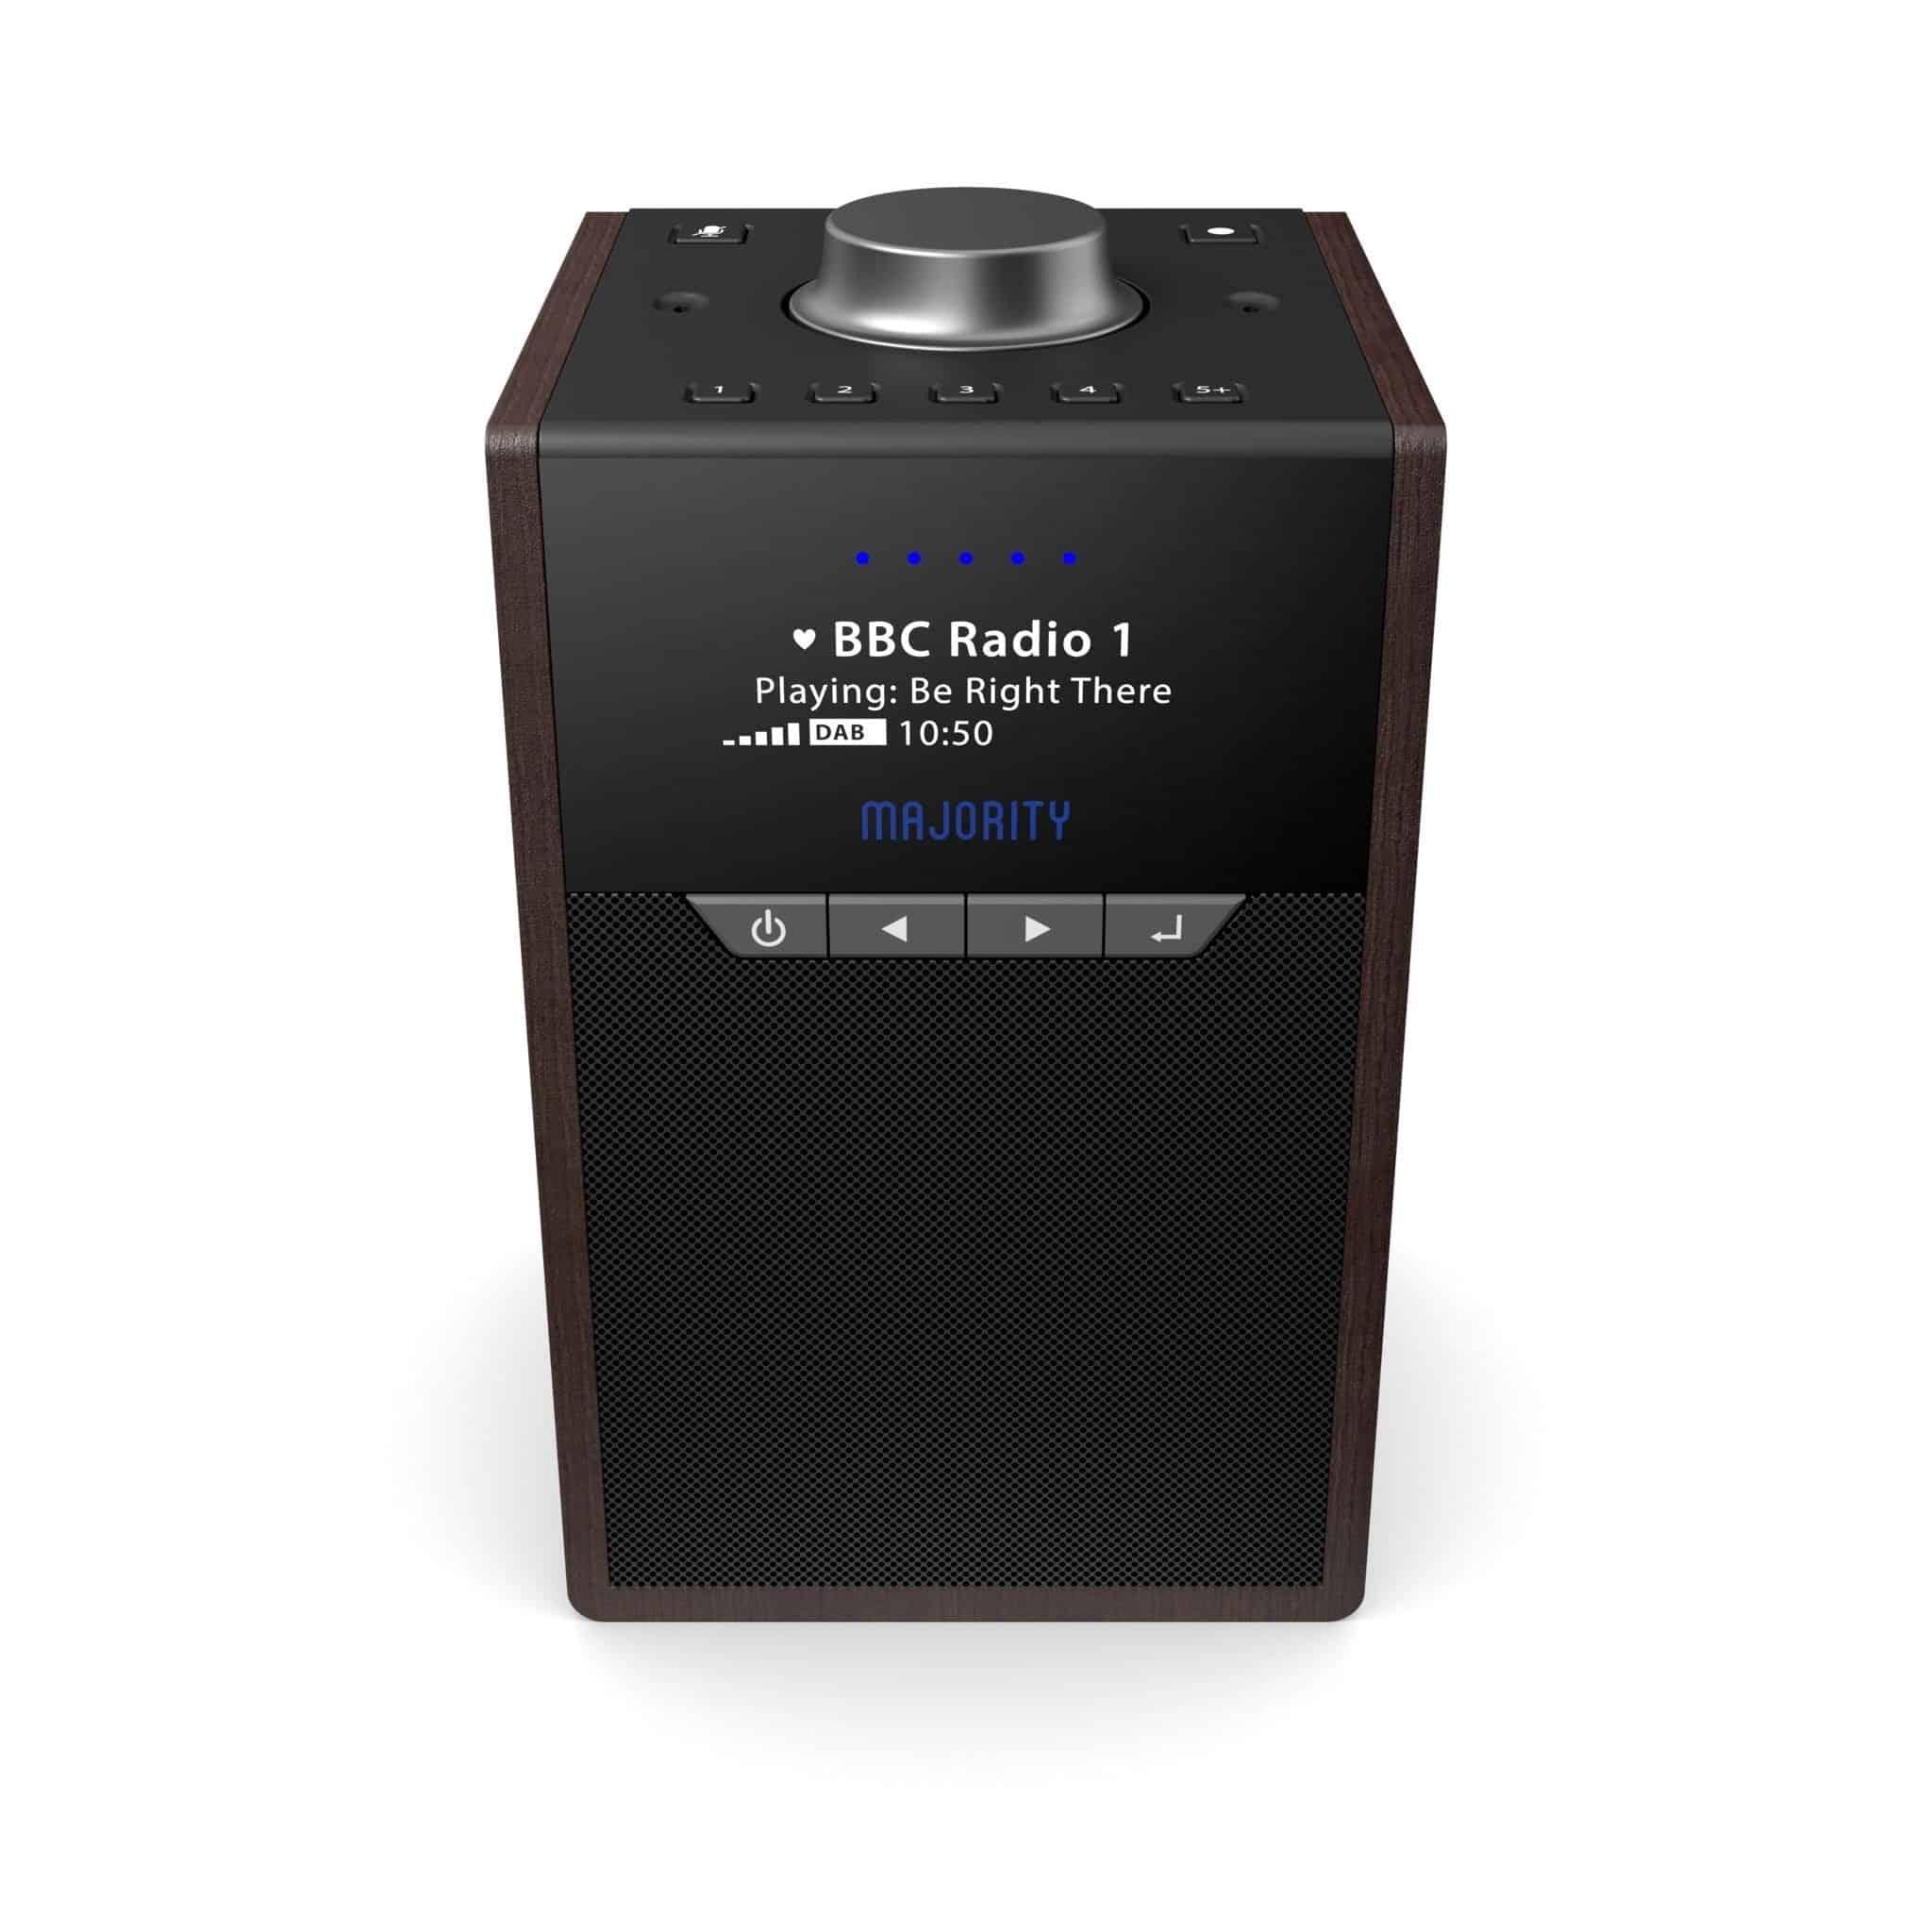 Majority Newton Alexa DAB Radio